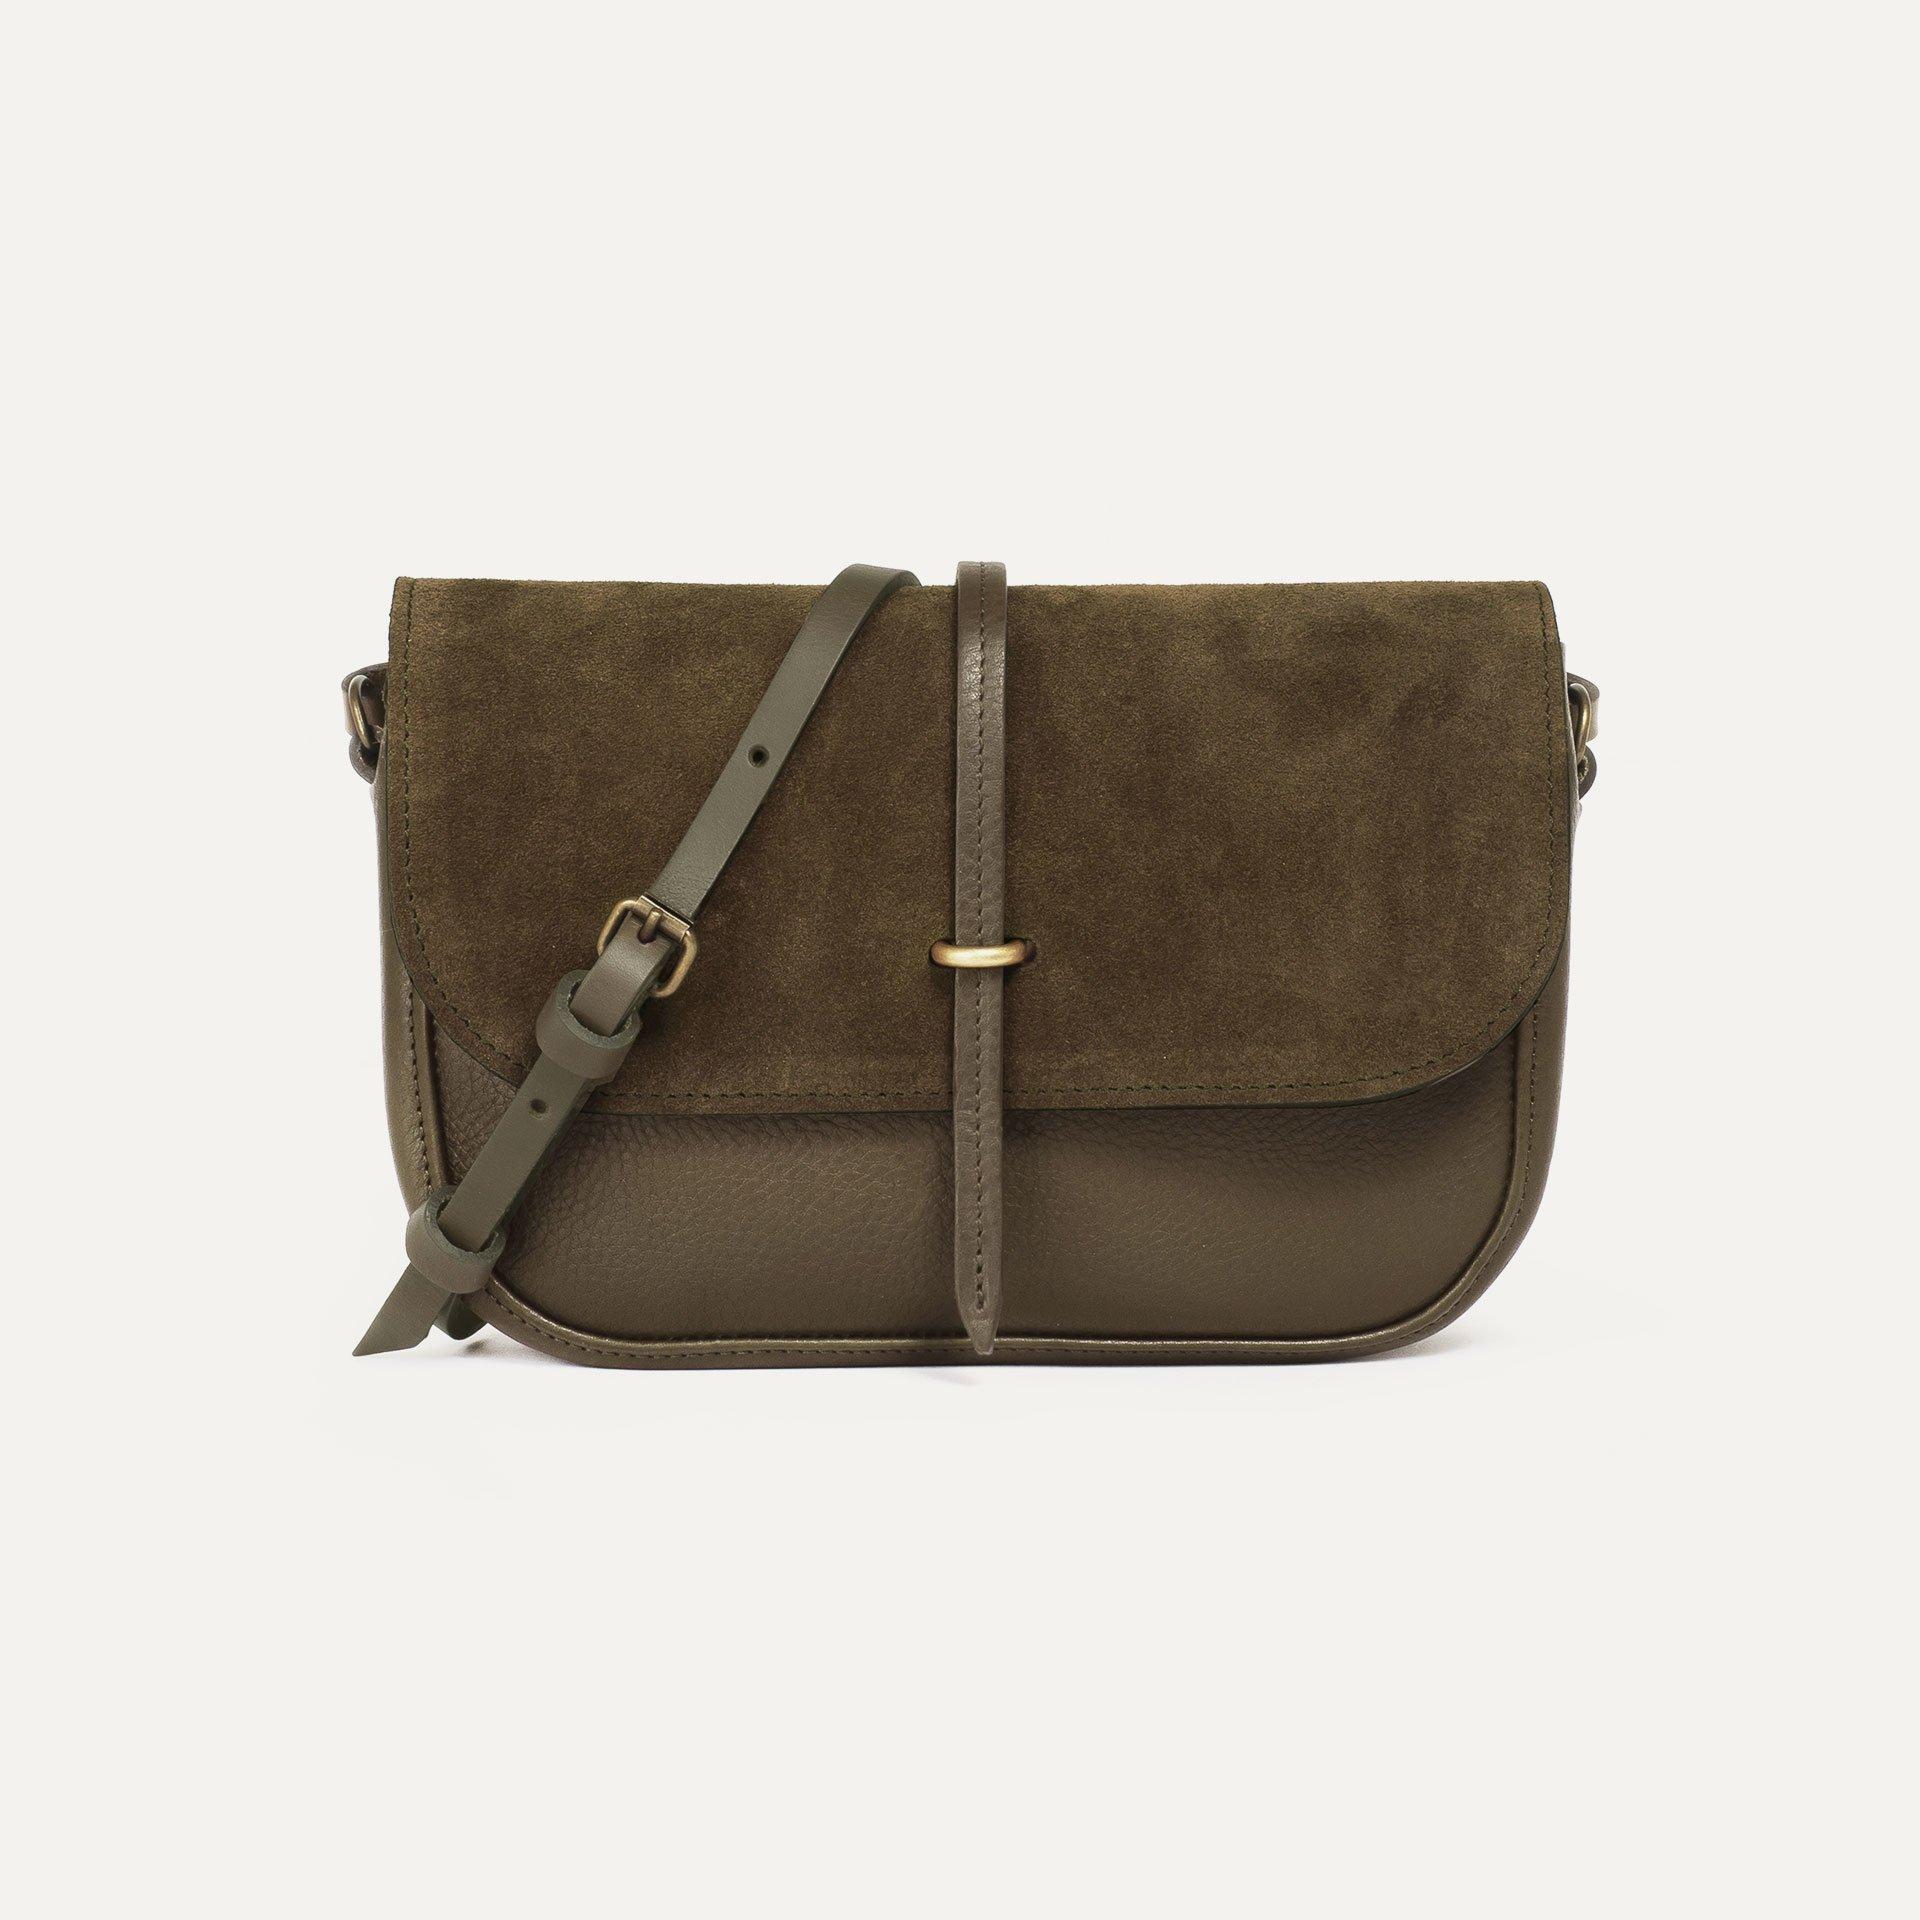 Pastis handbag - Khaki / Mix (image n°1)